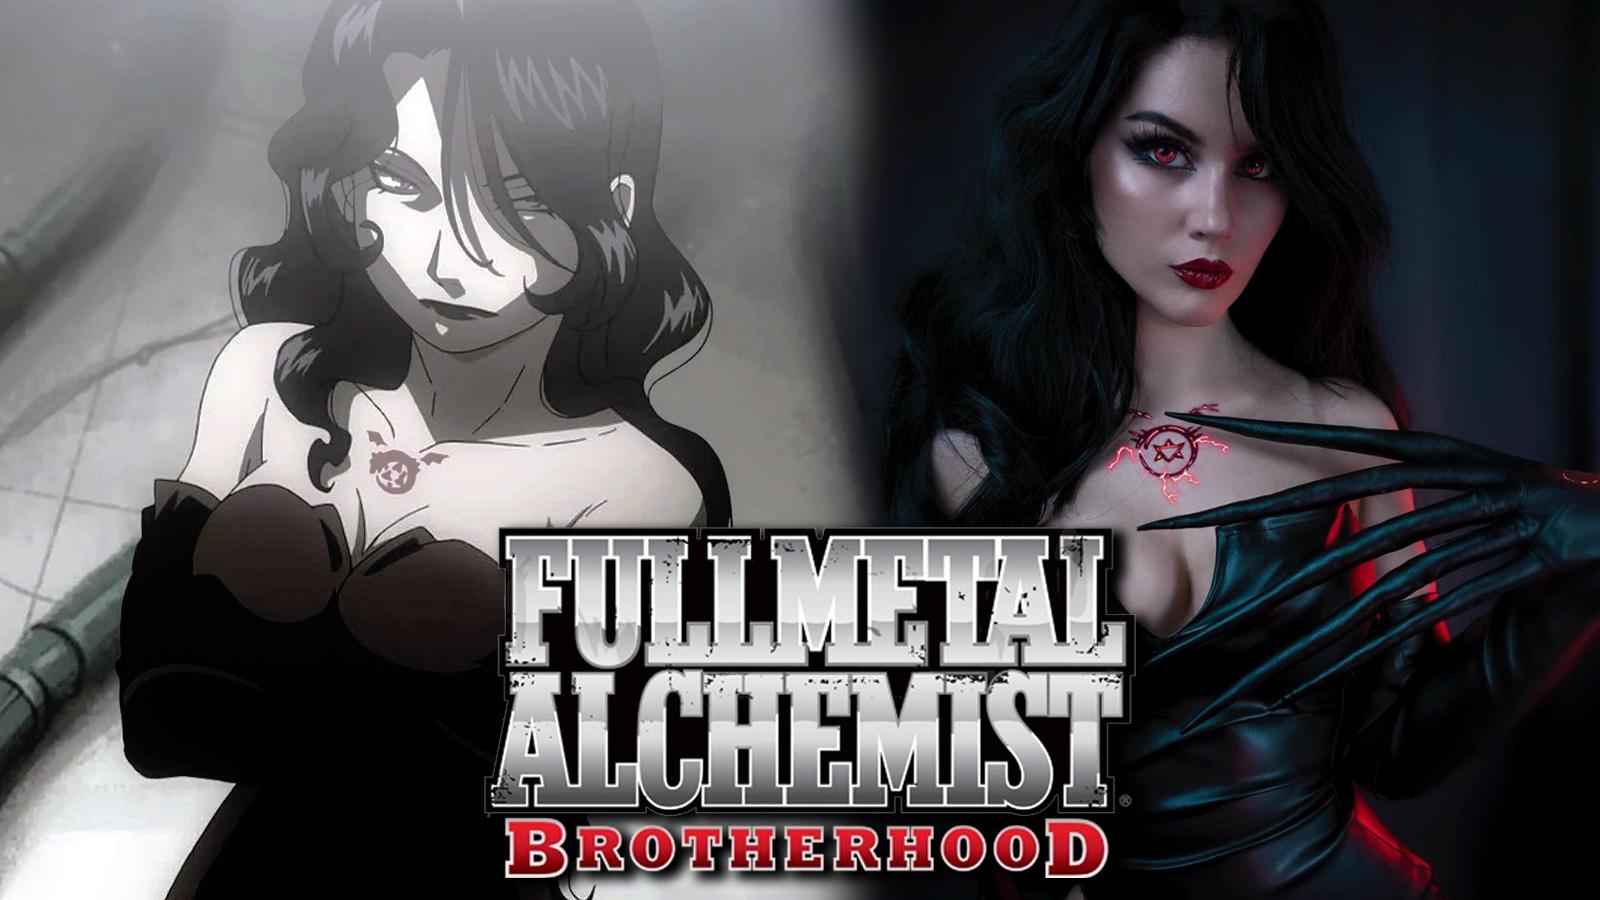 Screenshot of Lust from Fullmetal Alchemist: Brotherhood anime next to cosplayer.